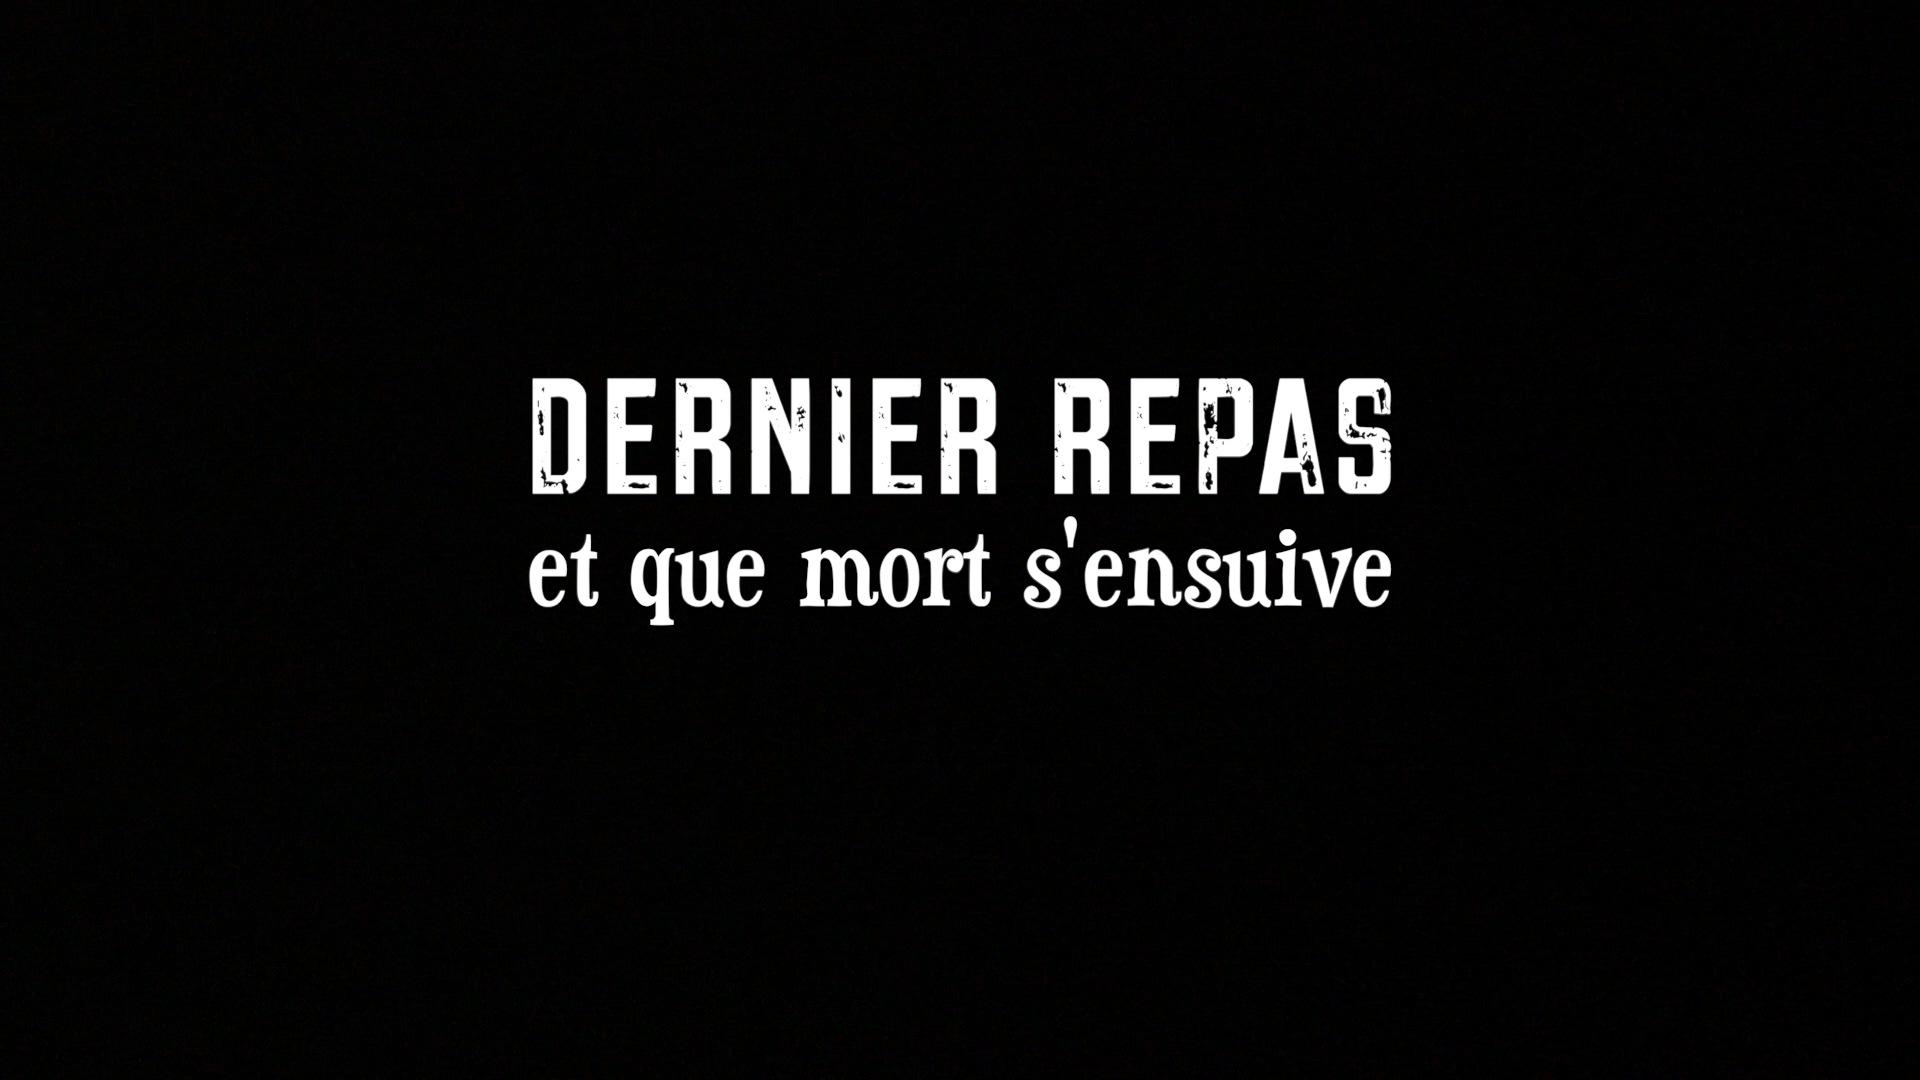 DERNIER_REPAS_titre-1481663460.jpg